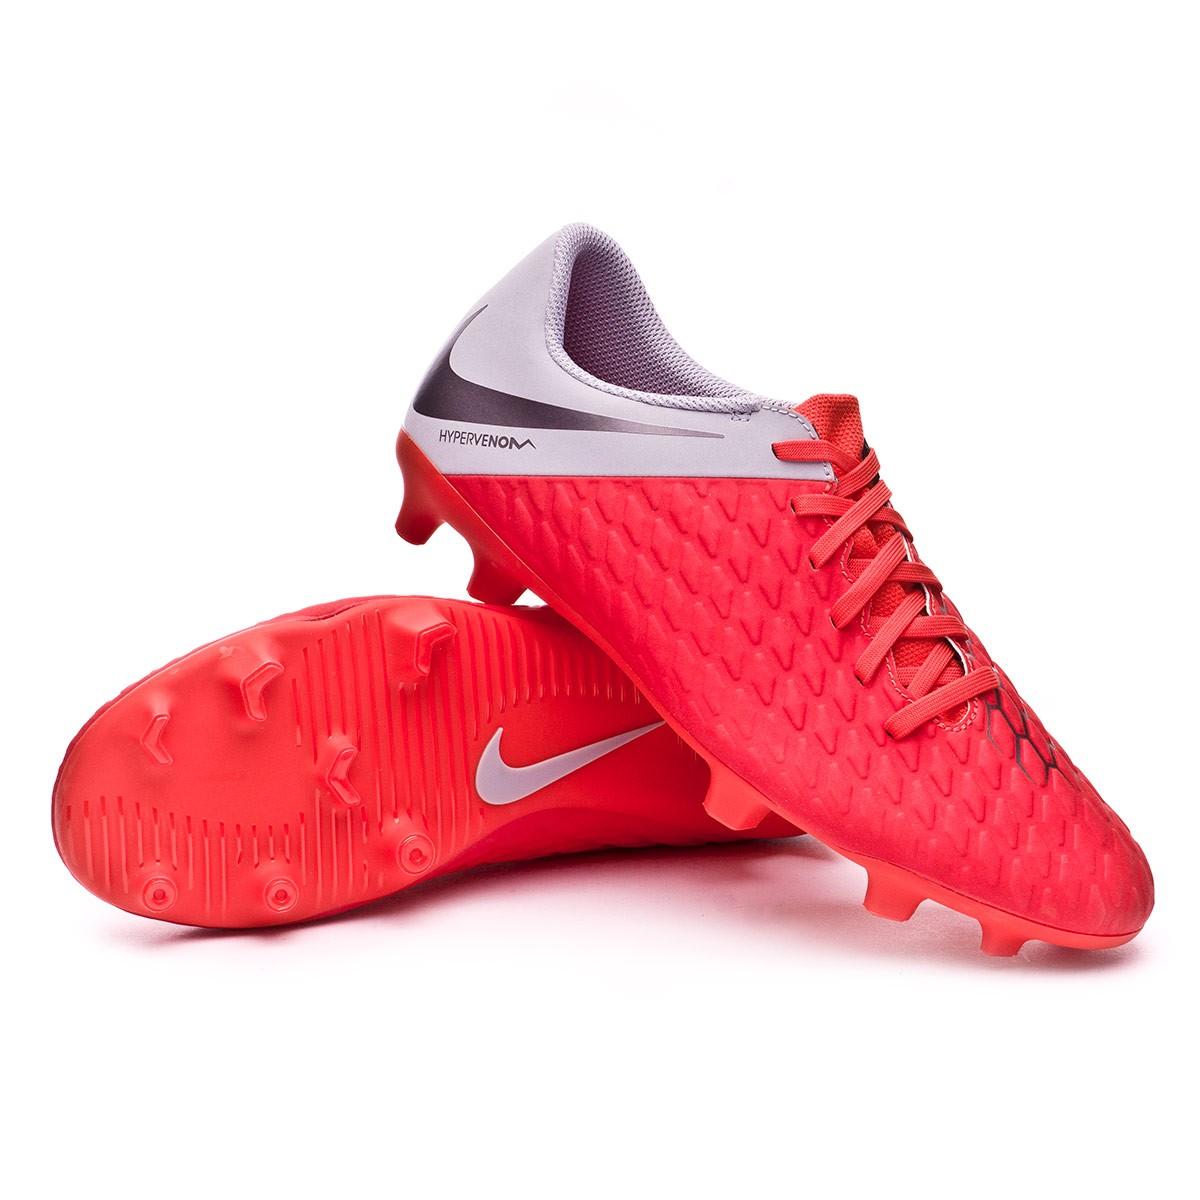 4535b4284 Football Boots Nike Hypervenom Phantom III Club FG Light crimson ...